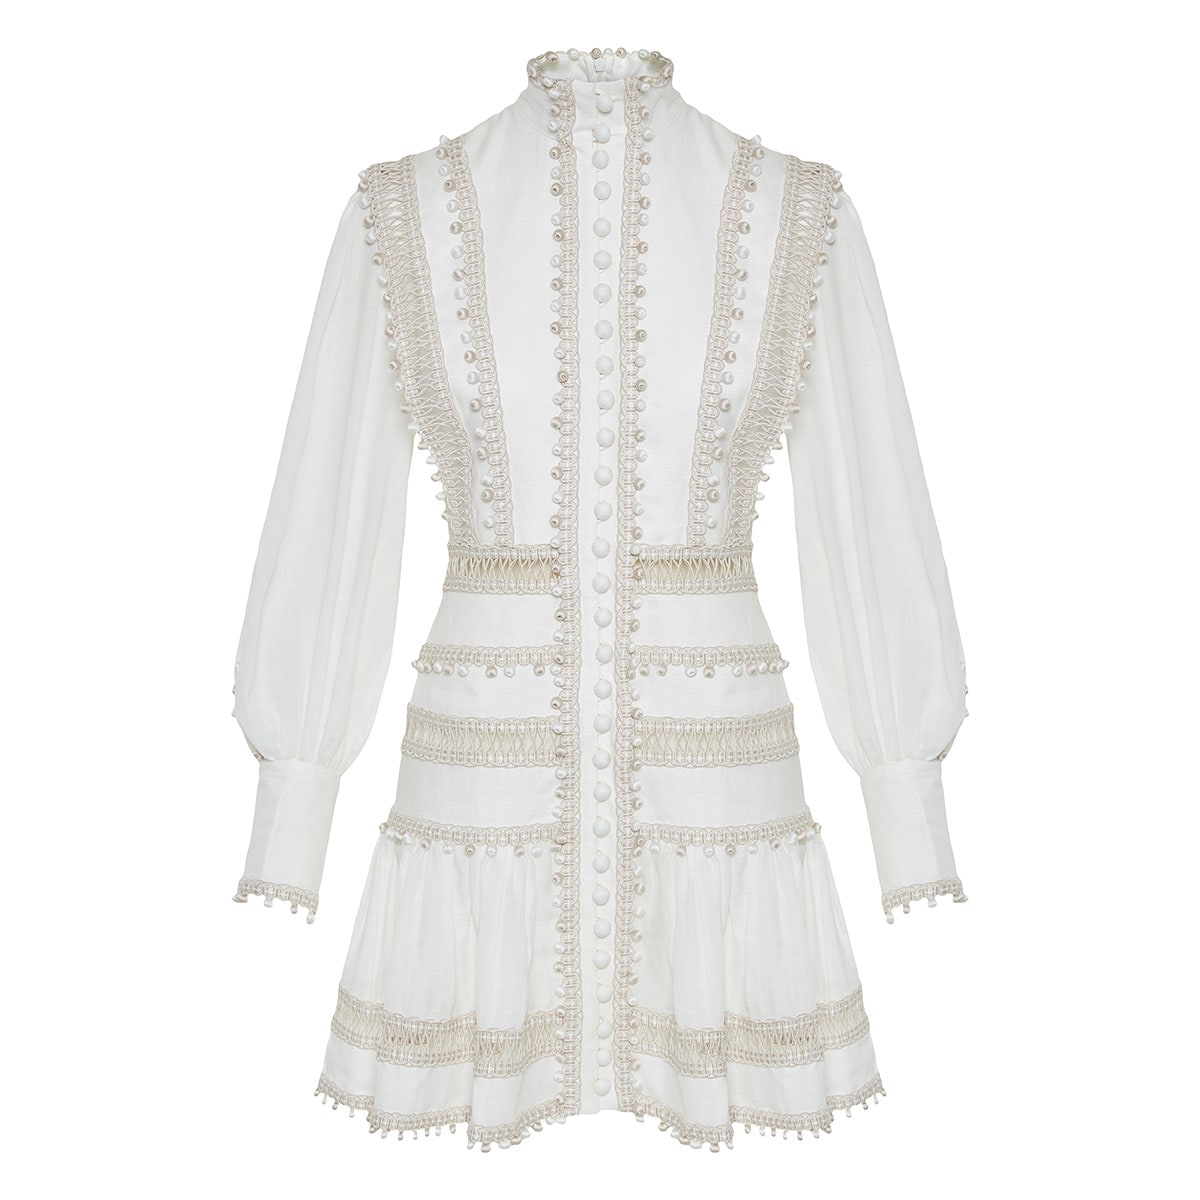 Super Eight Corded embellished mini dress